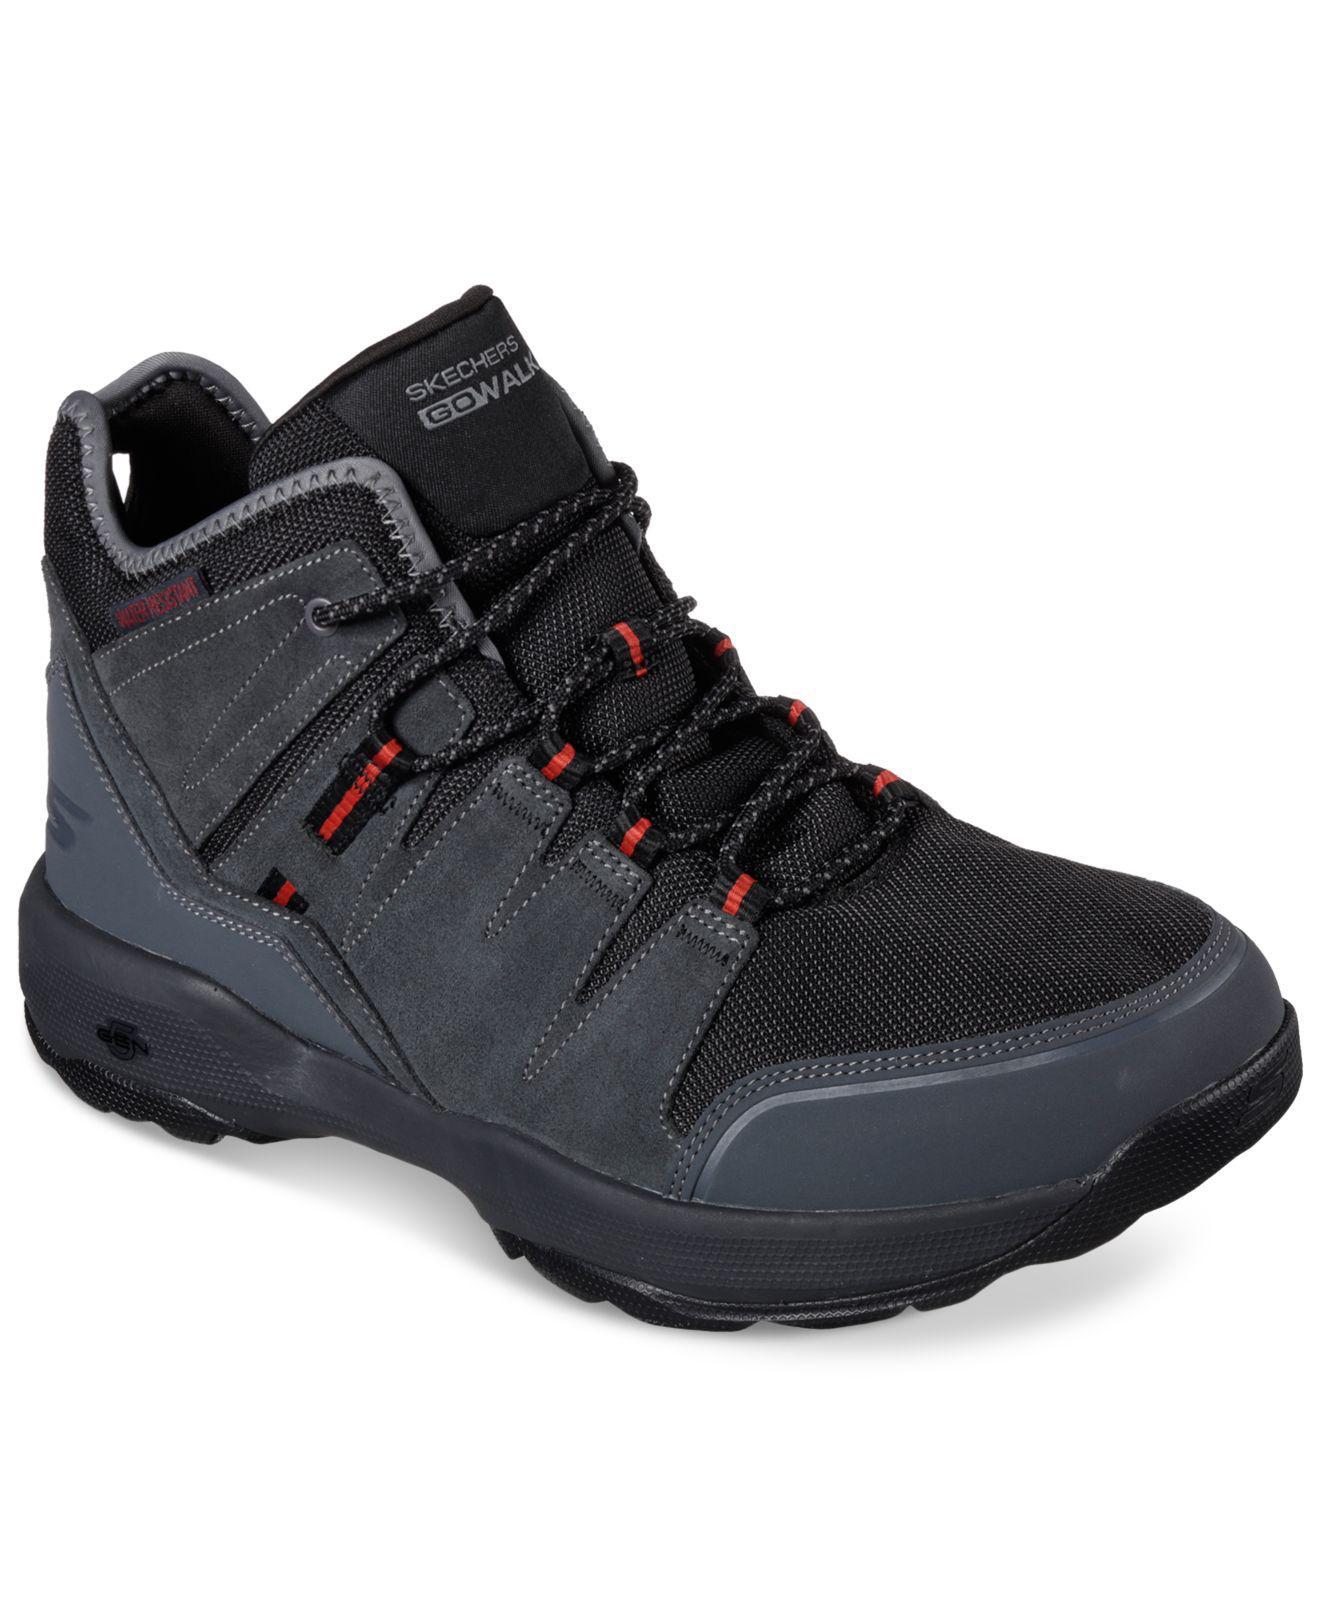 hot sale online 142d2 5c8f1 Lyst - Skechers Men s Go Walk Outdoor 2 Casual Sneakers From Finish ...